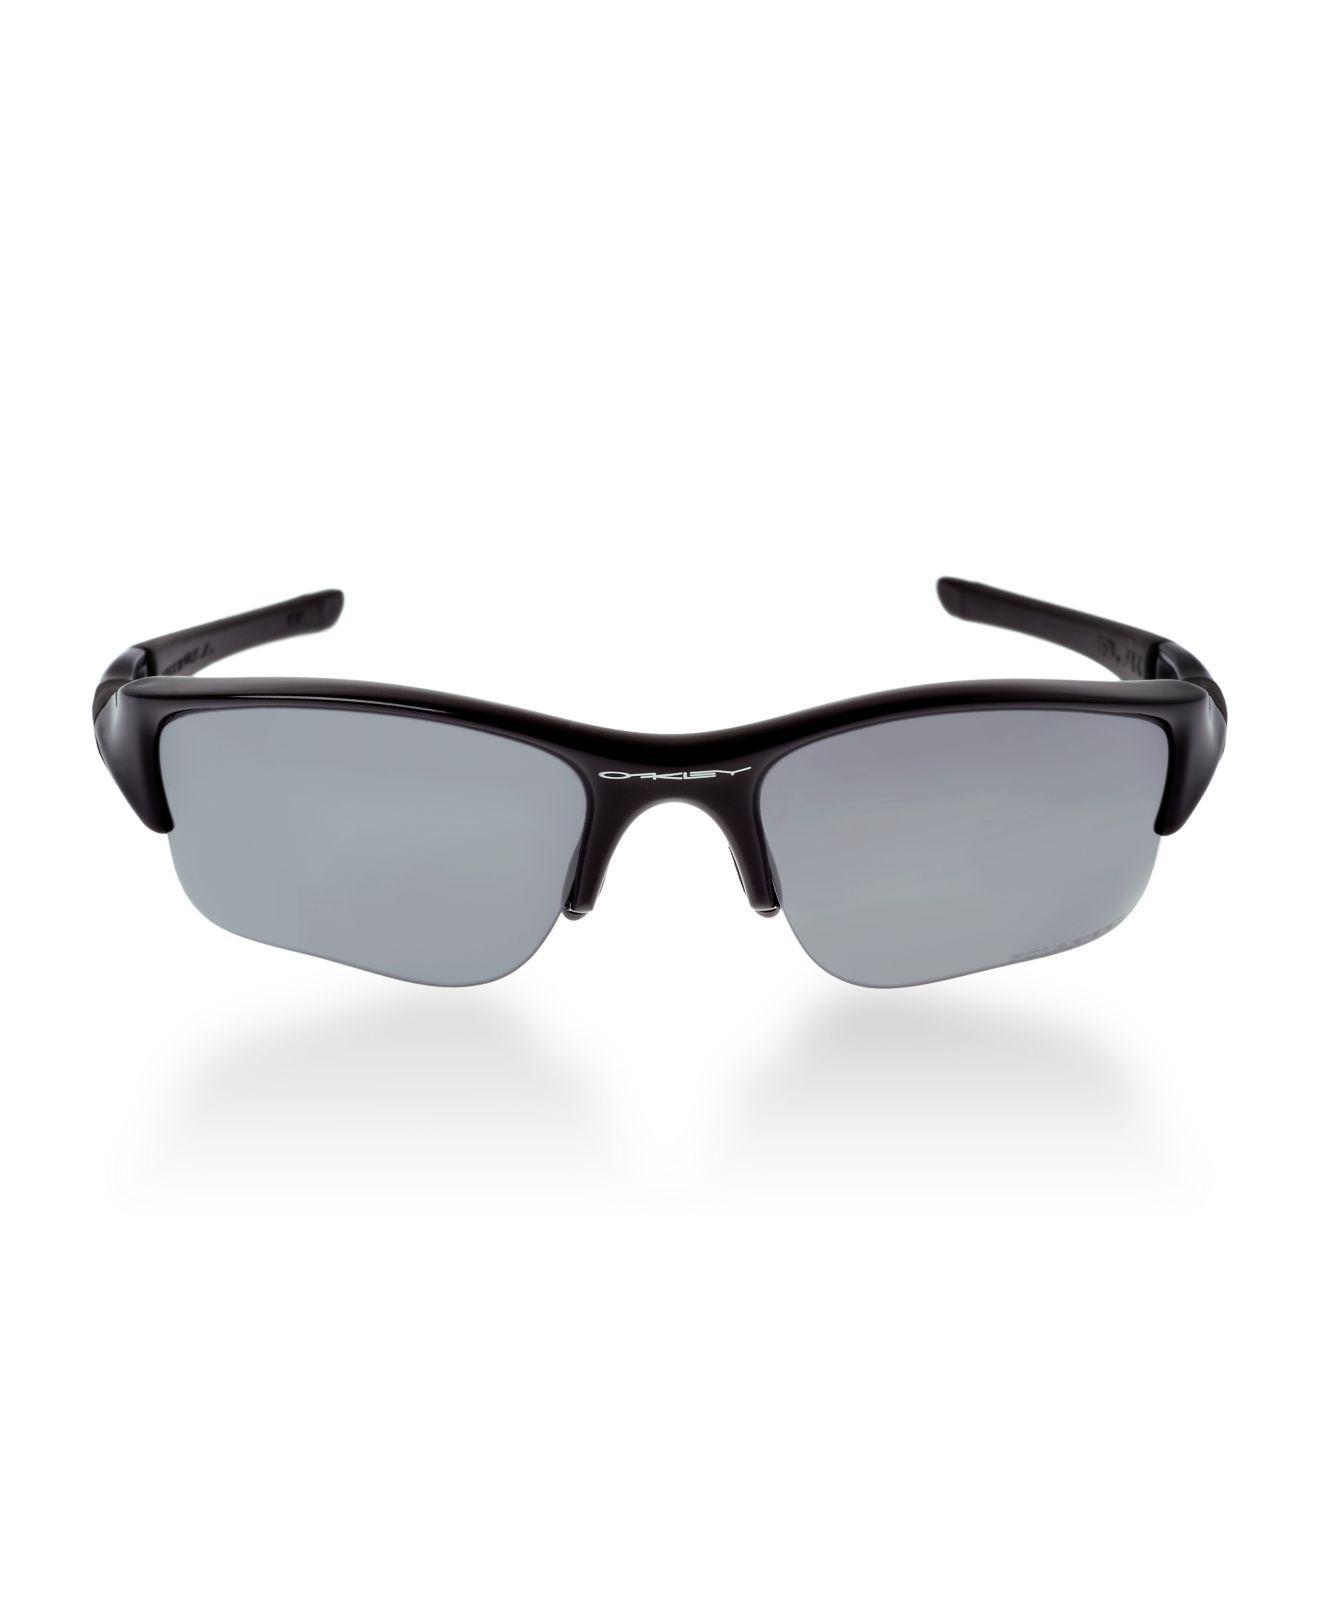 4cb3112f99 Lyst - Oakley Sunglasses